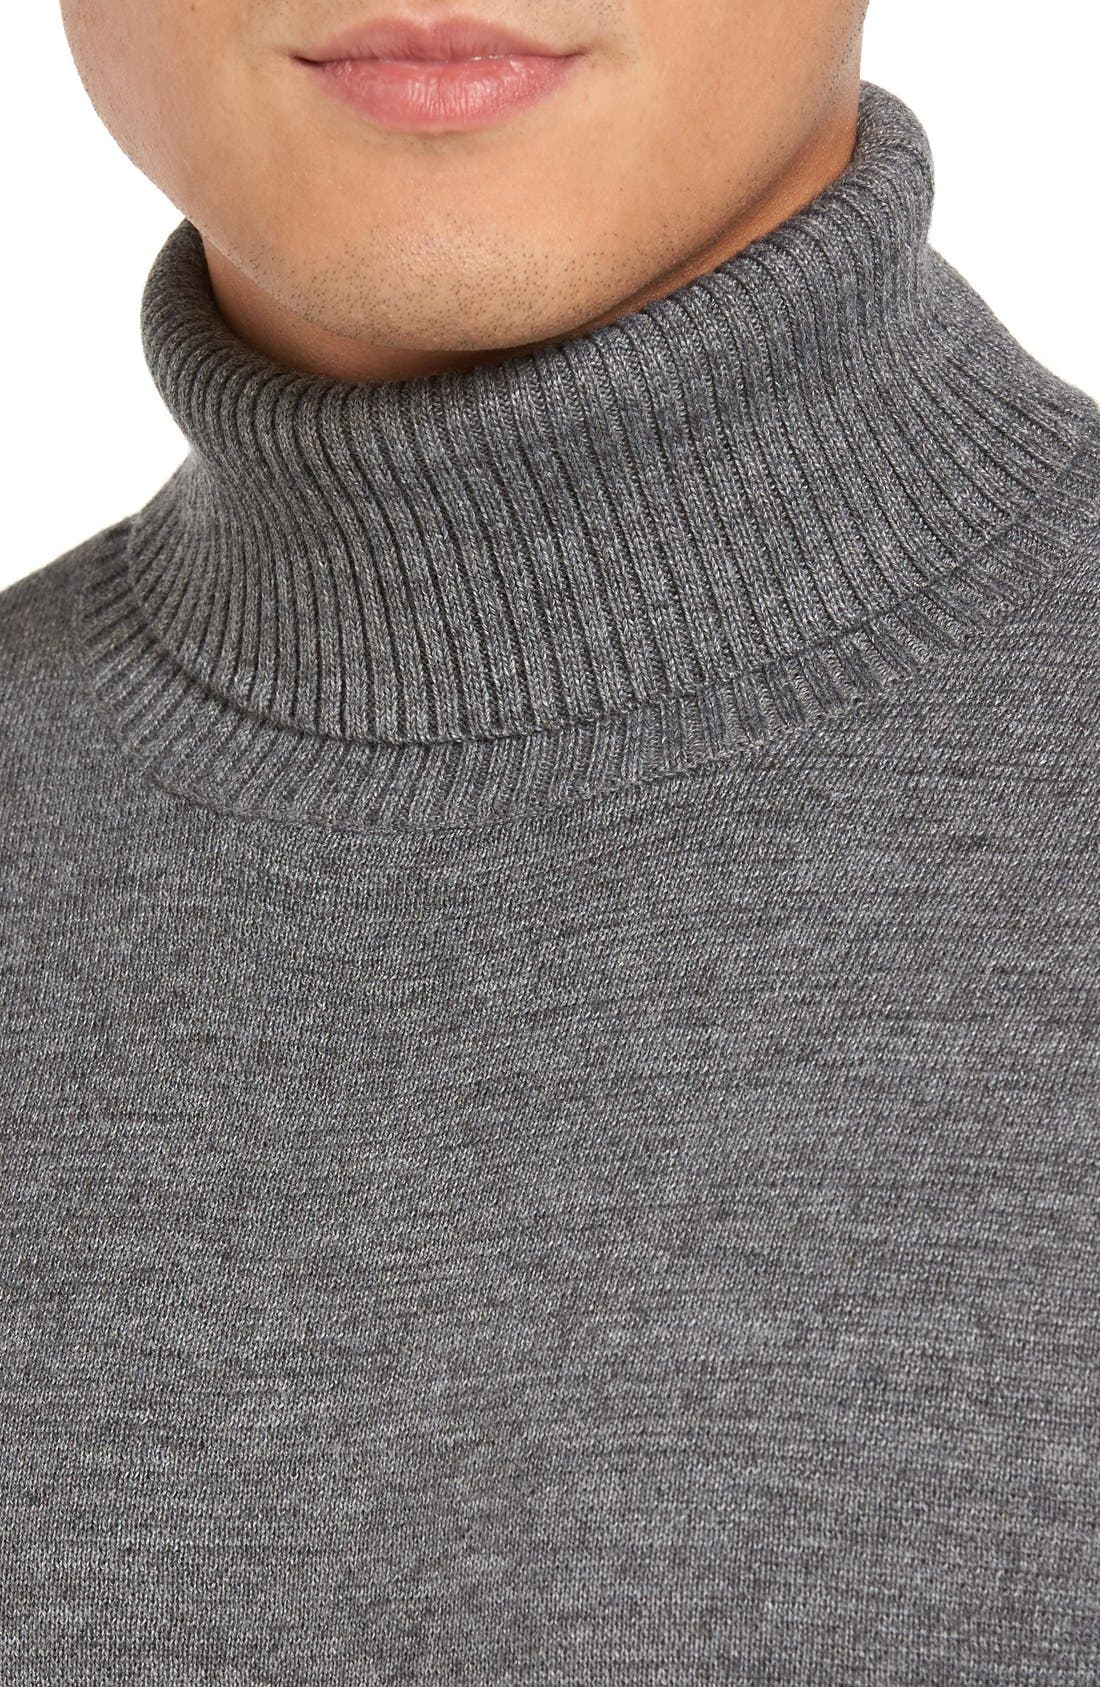 Alternate Image 4  - Slate & Stone Merino Wool Blend Turtleneck Sweater